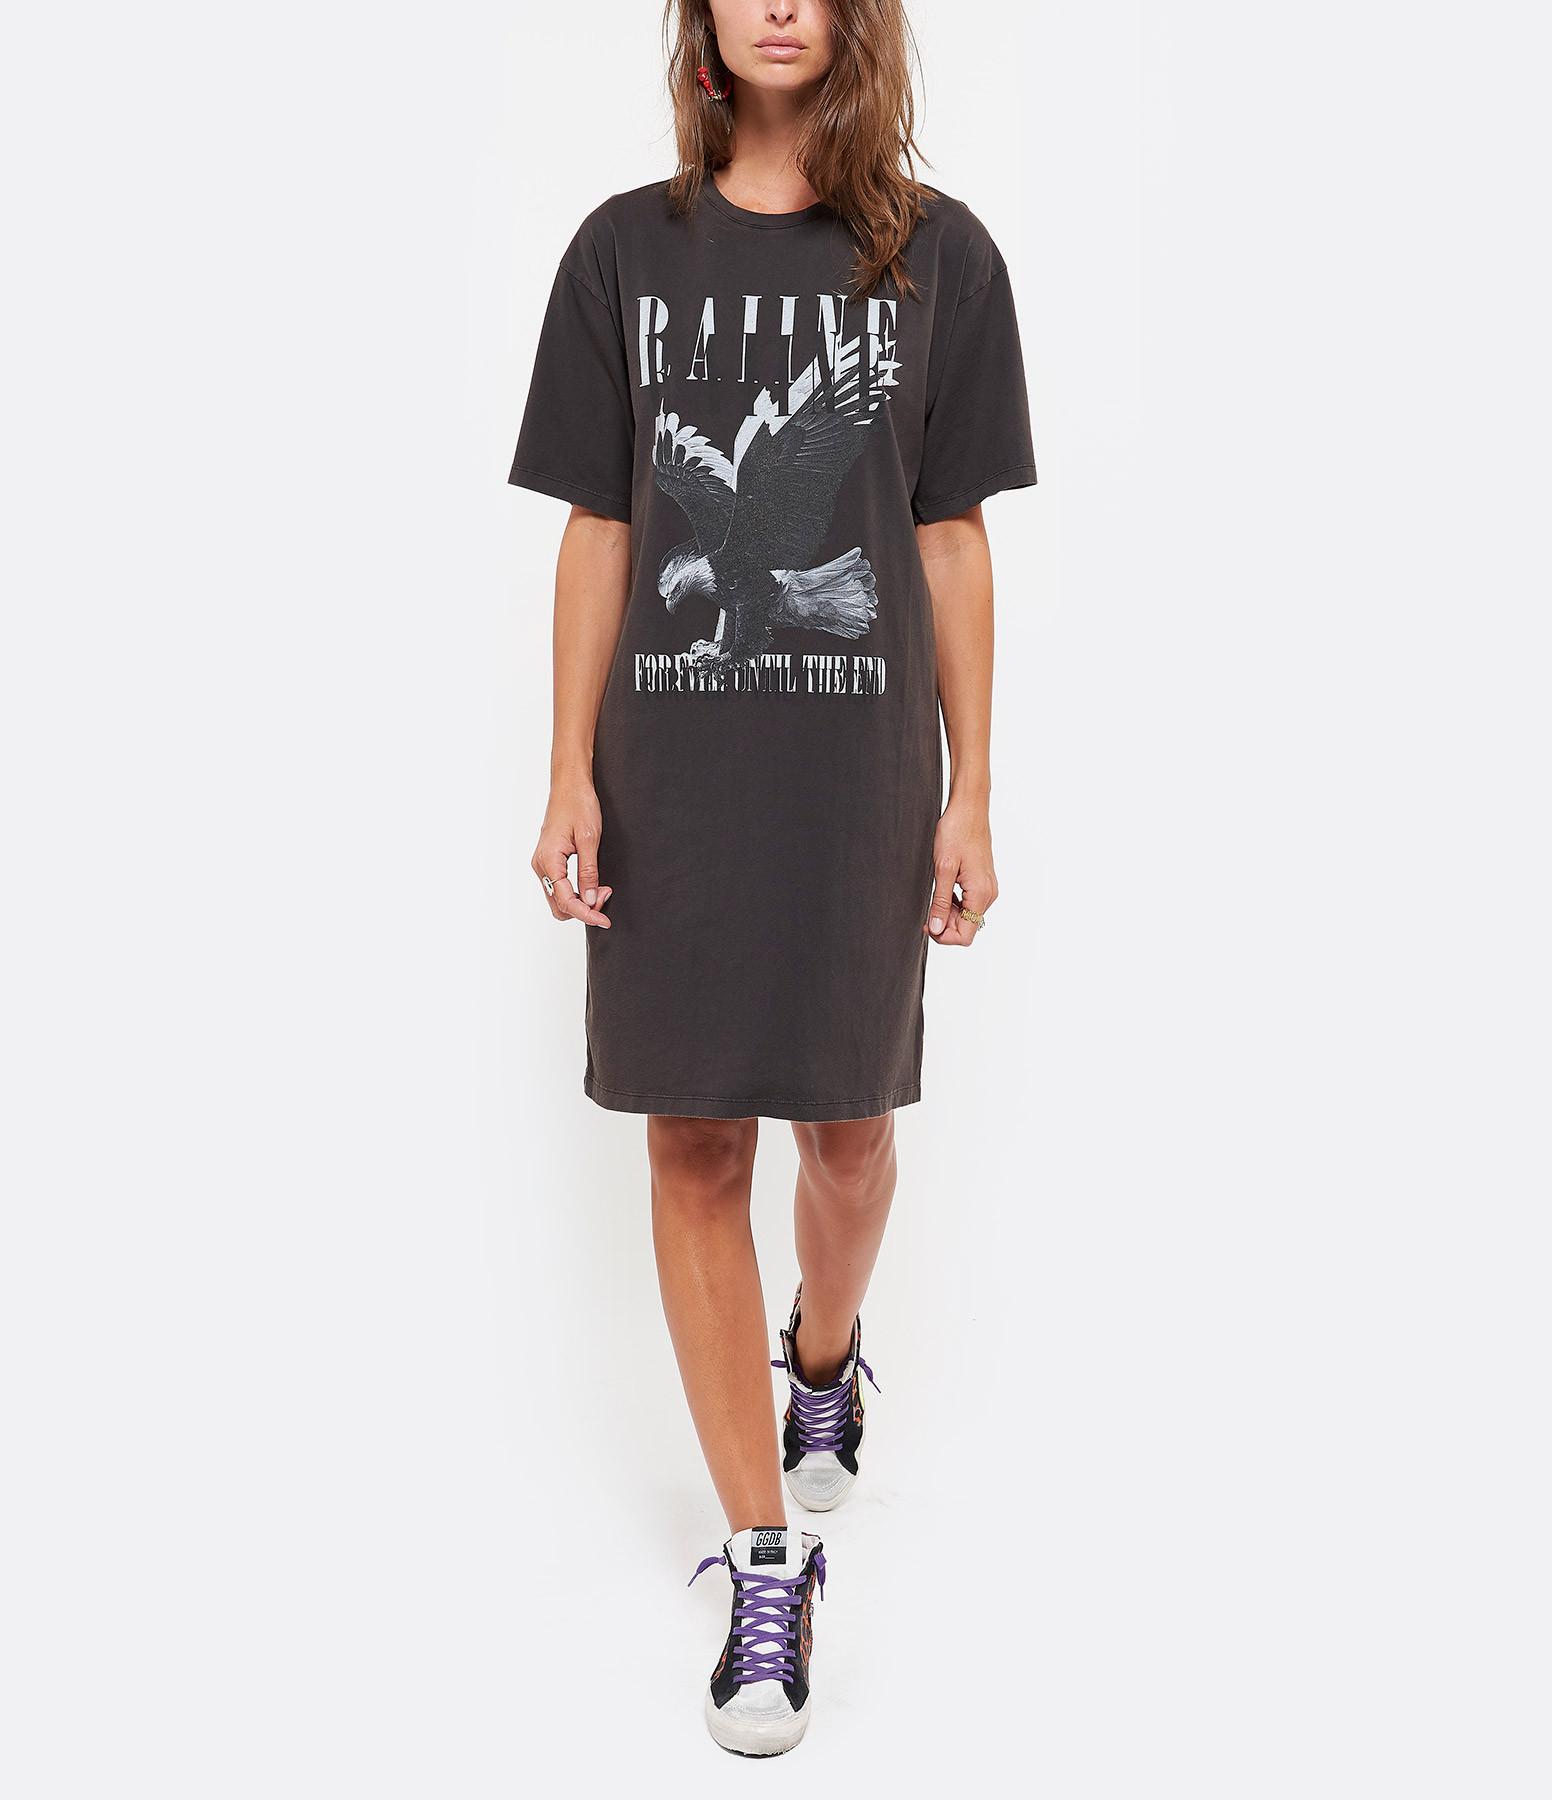 RAIINE - Tee-shirt Darvill Coton Charbon